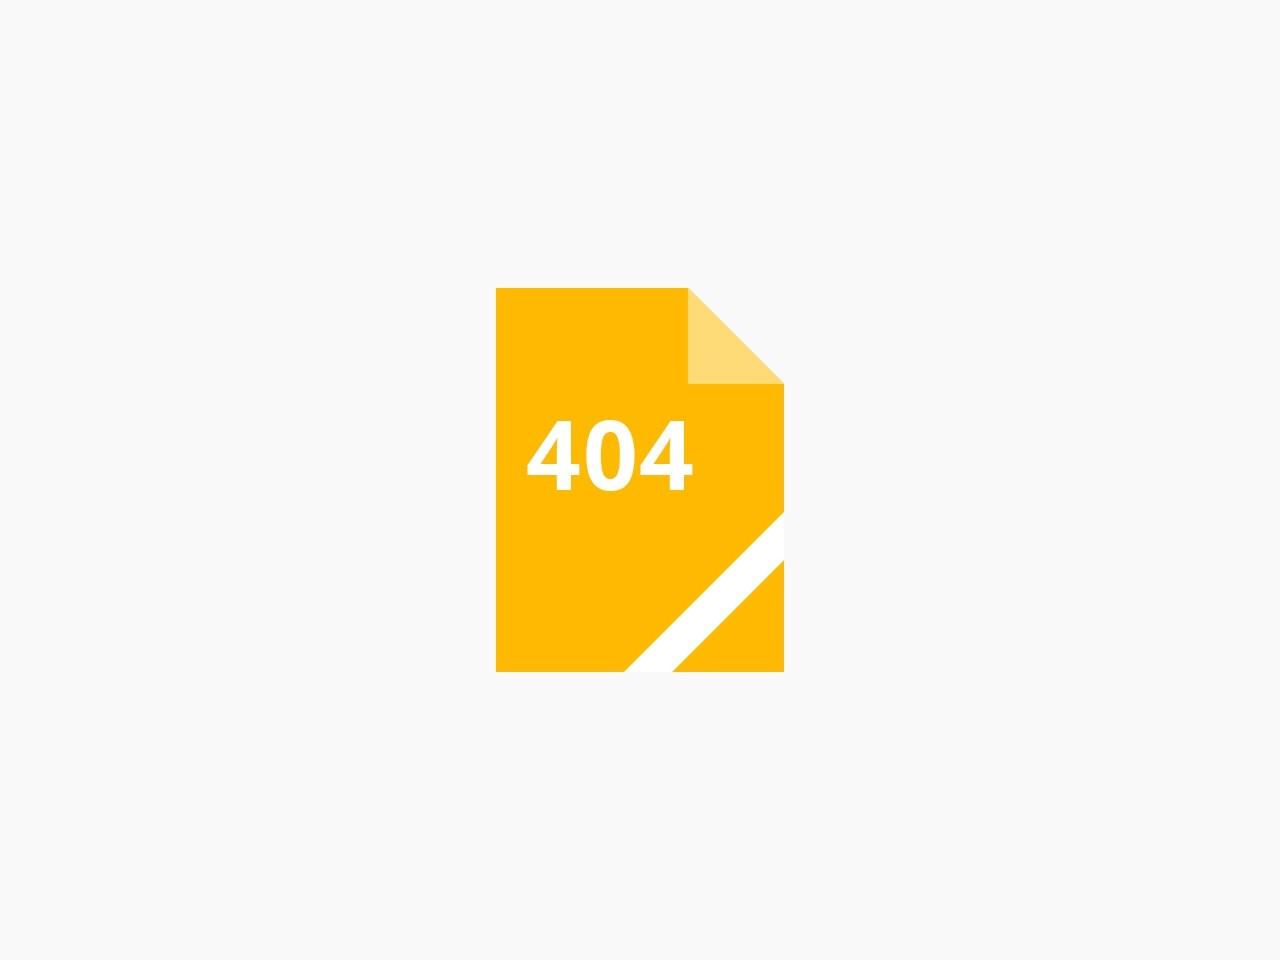 emmascottdesign.com